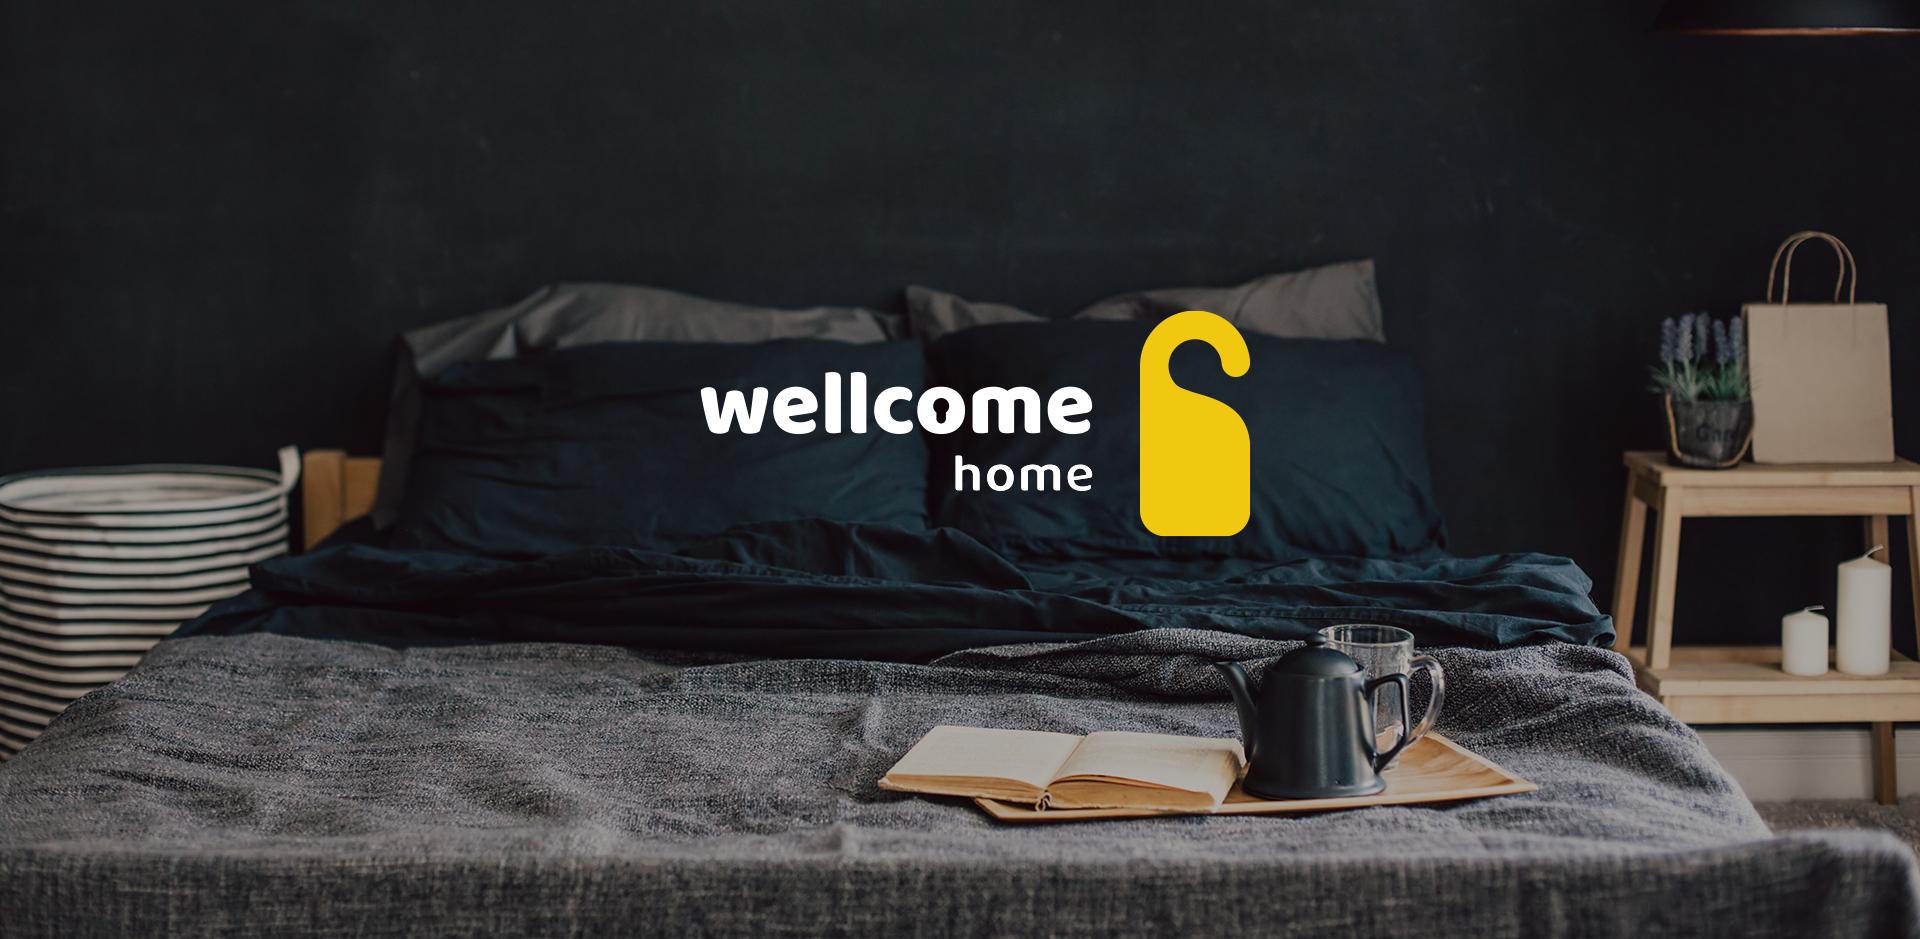 Wellcome Home